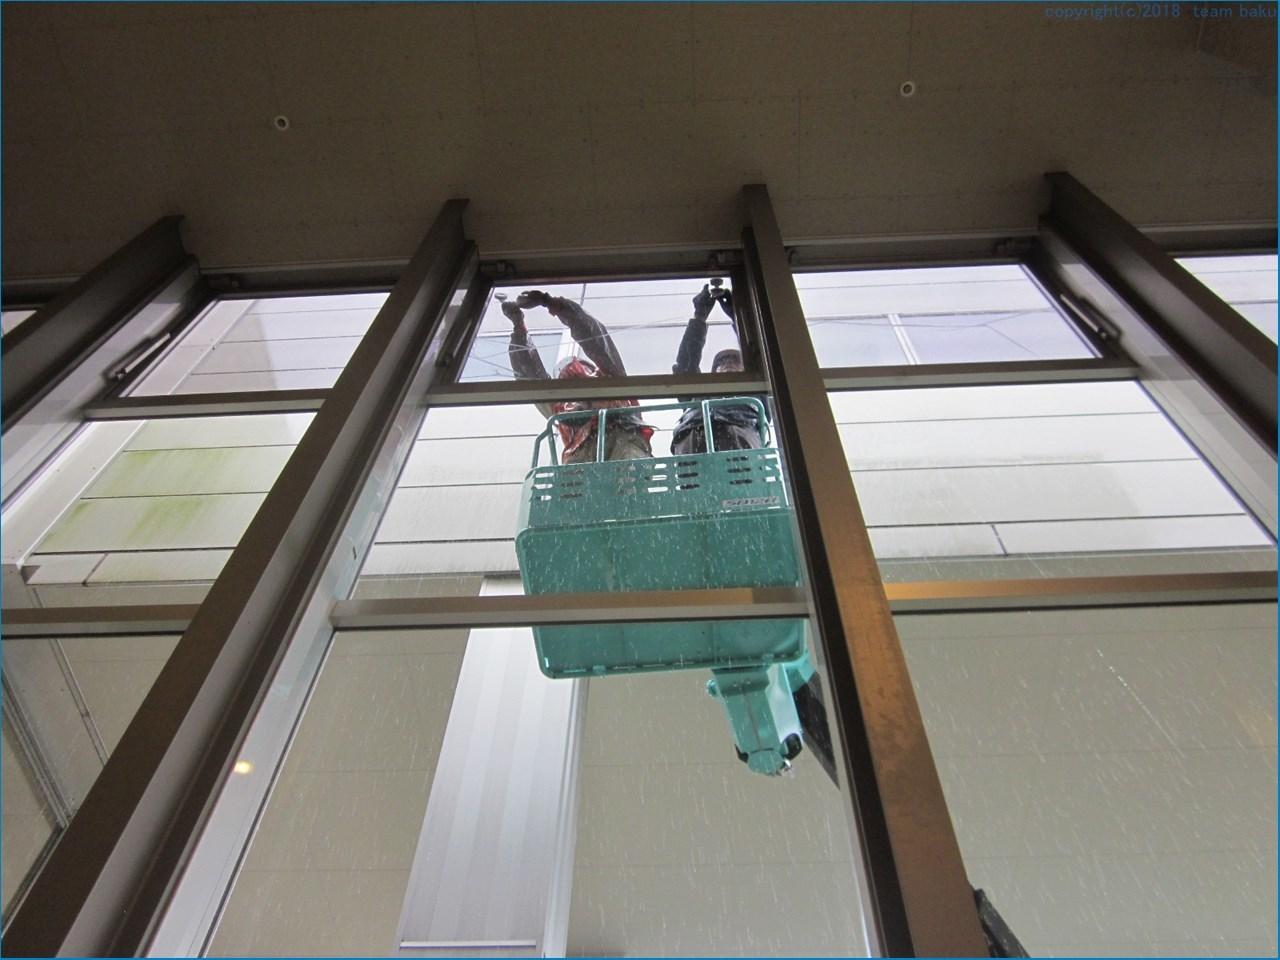 N病院グループ 特定建築物の定期報告調査4_c0376508_14135192.jpg